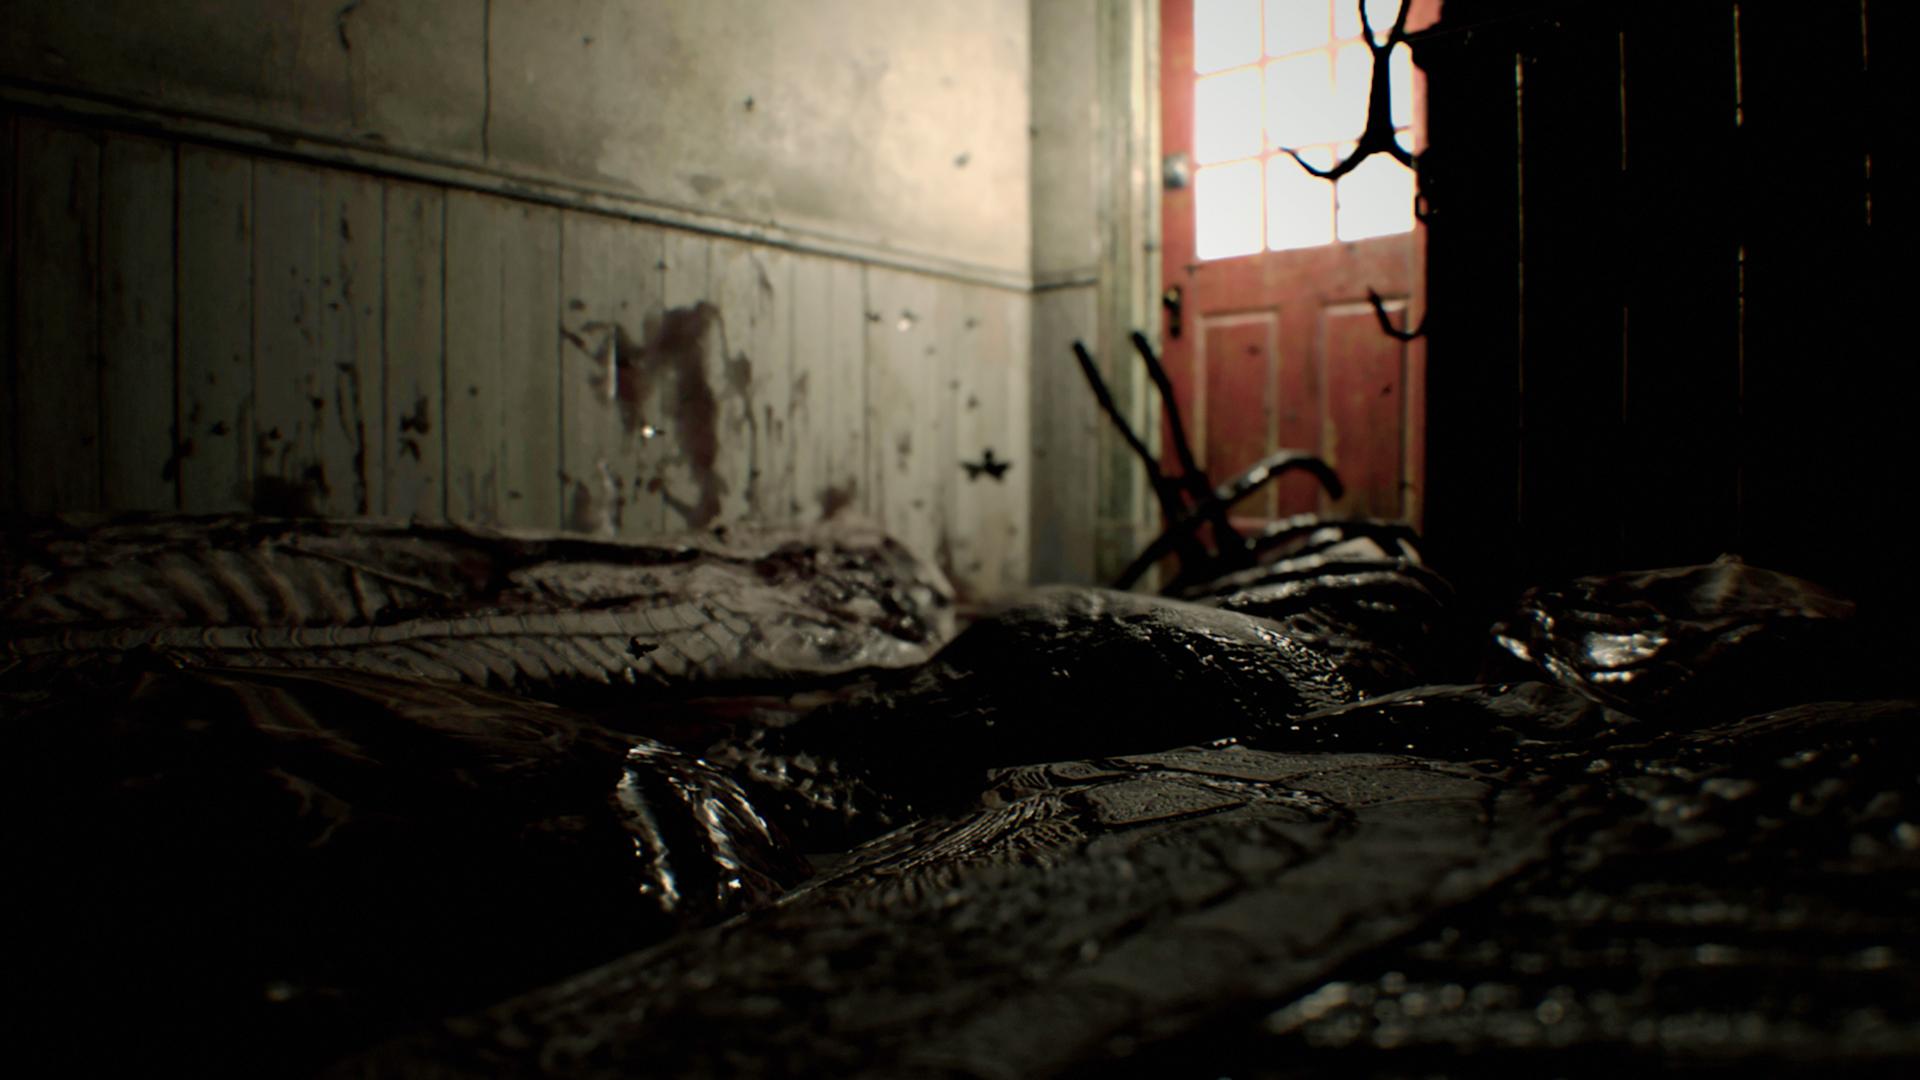 Most Viewed Resident Evil 7 Biohazard Wallpapers 4k Wallpapers